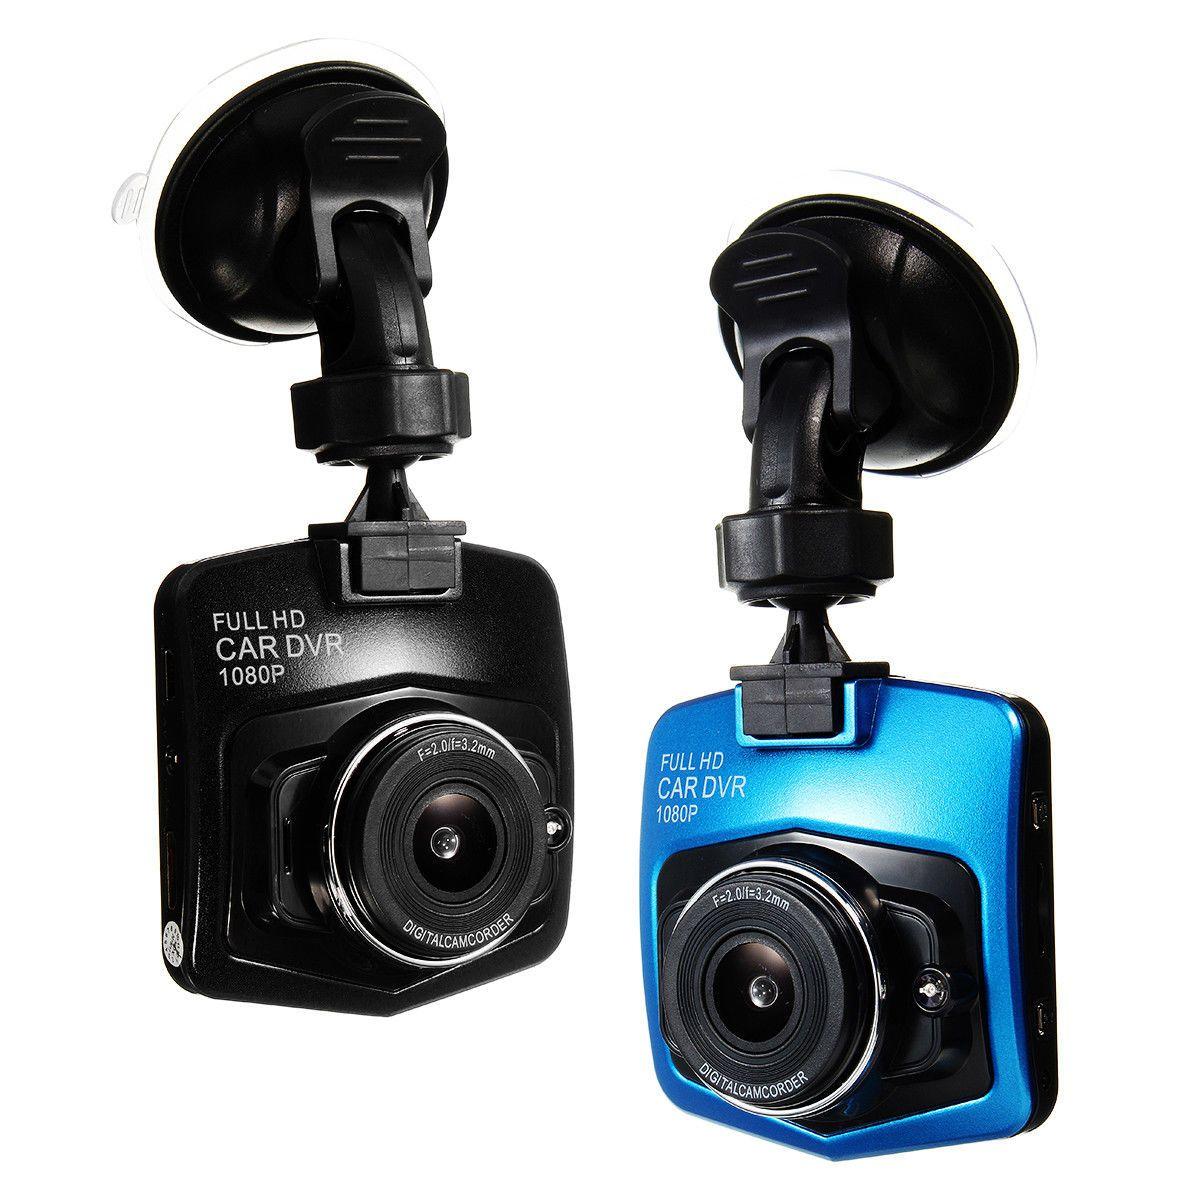 Car Dvr 1080p Hd Night Vision Car Video Recorder Camera Vehicle Dash